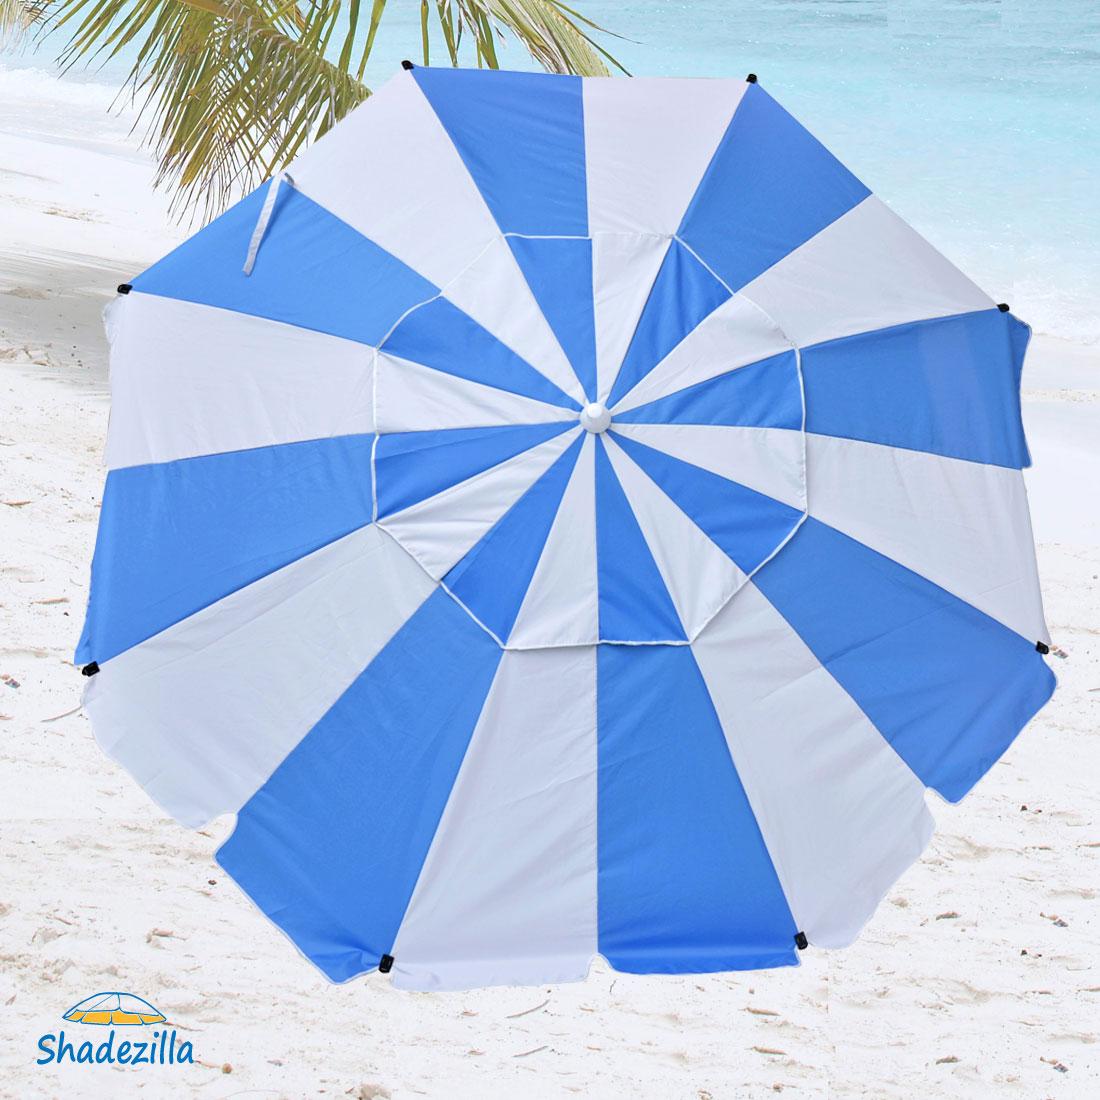 8 ft Premium Heavy Duty Beach Umbrella with Fiberglass Ribs and UPF 100+